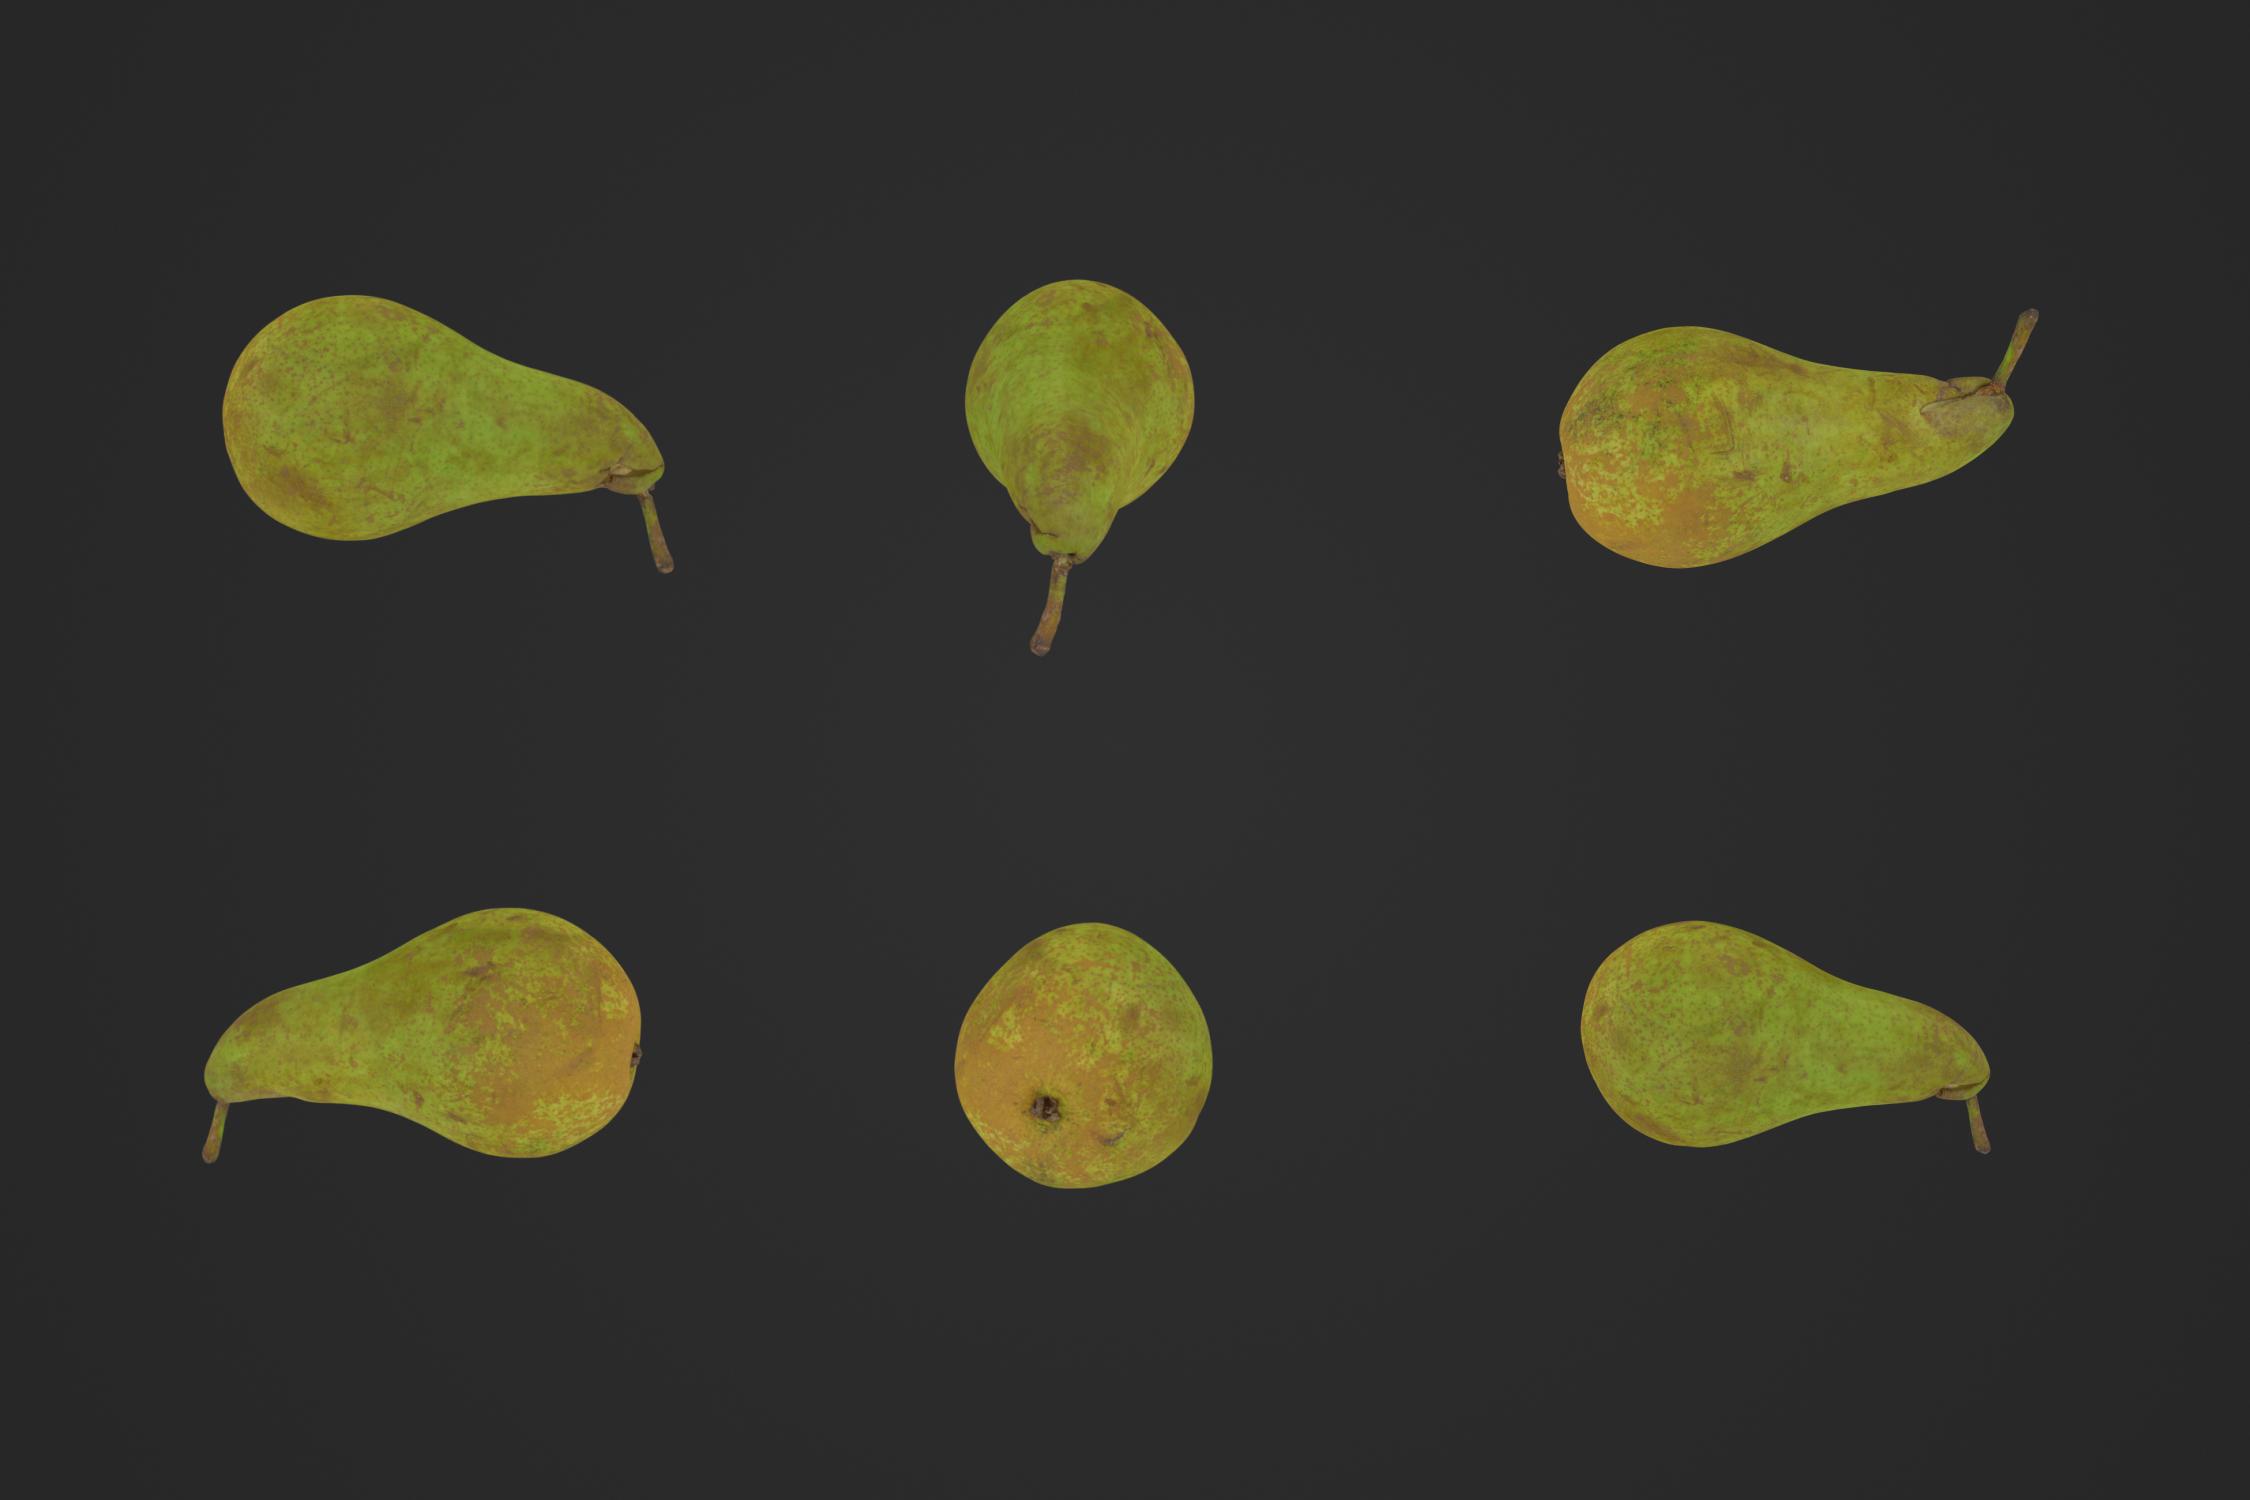 Pear_1_1.jpg